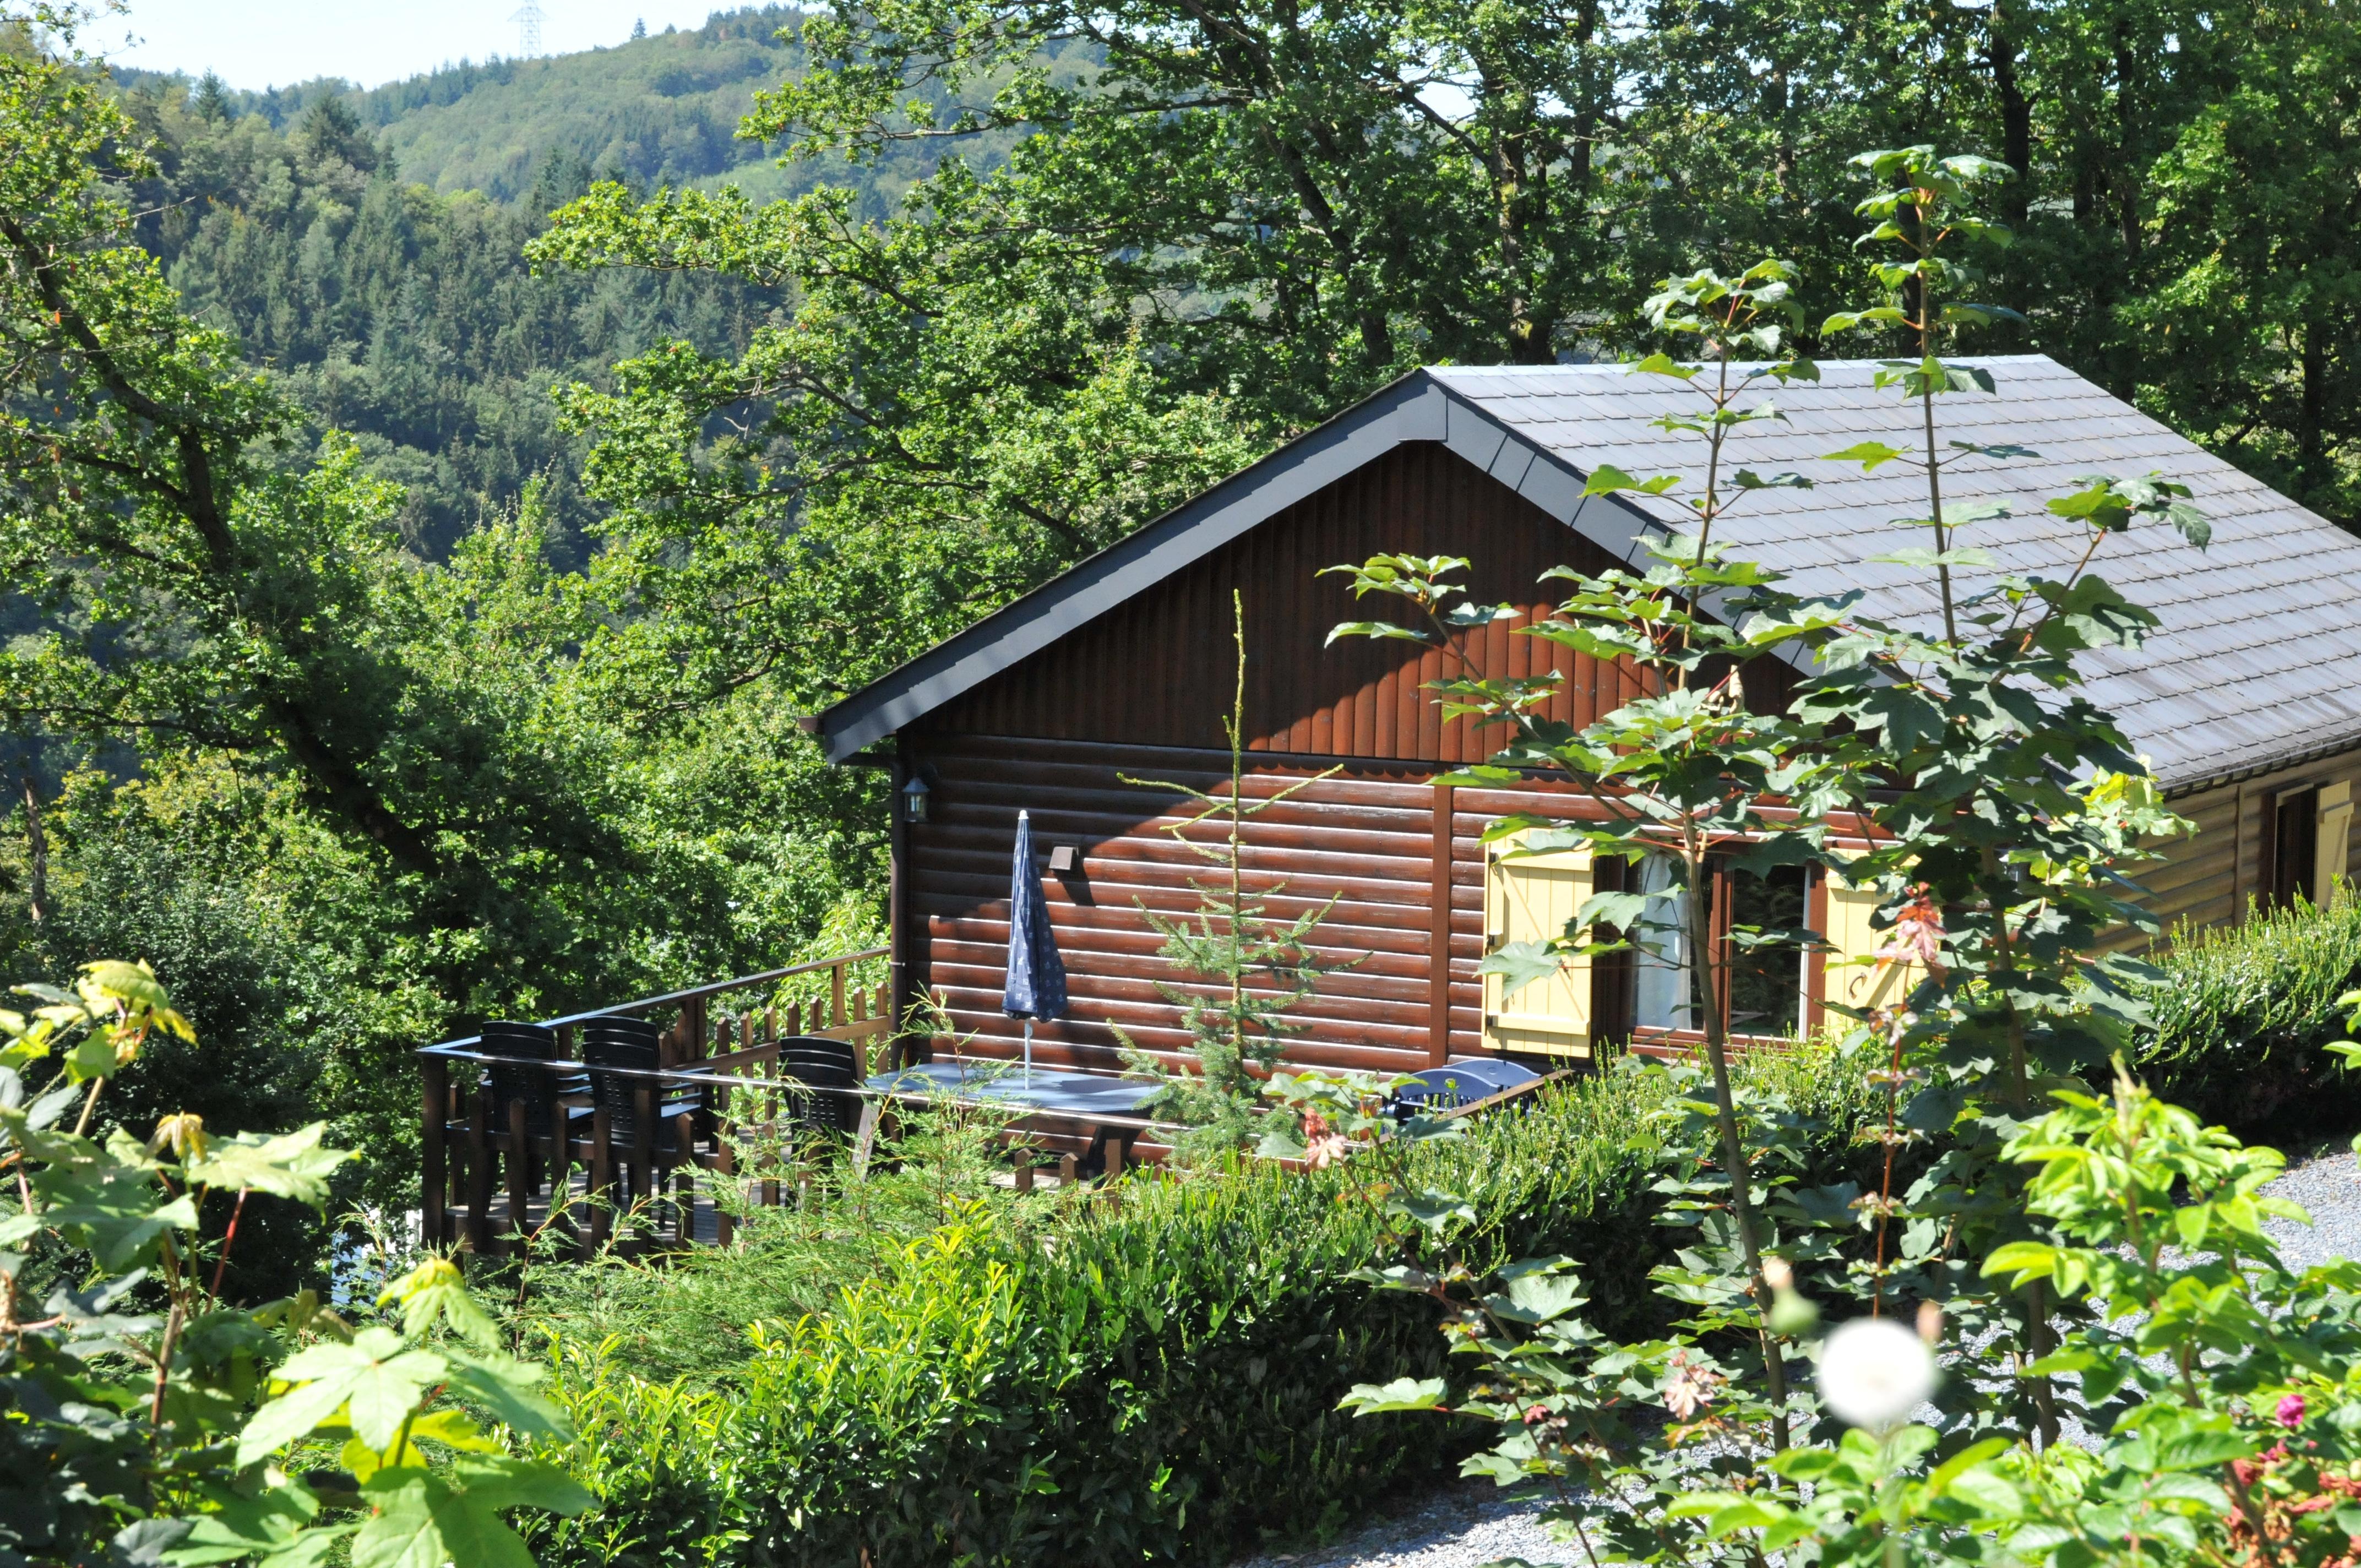 Vakantiehuis v nus 2 in la roche en ardenne belgi be6980 for Chalets te koop ardennen particulier